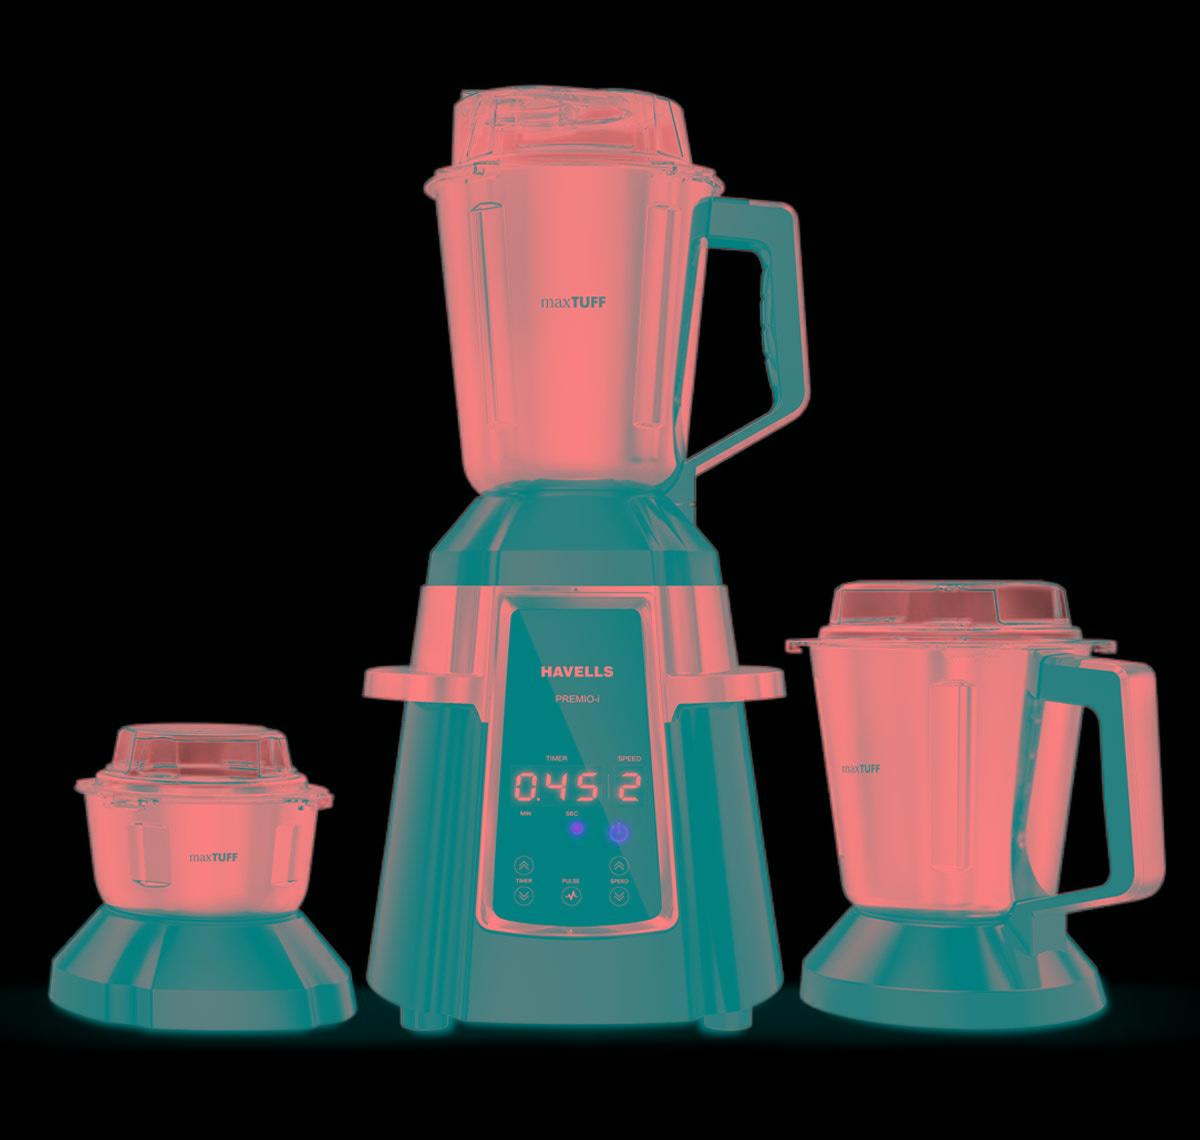 Havells Premio I Digital control Mixer Grinder 750 W (Black/3 Jars)